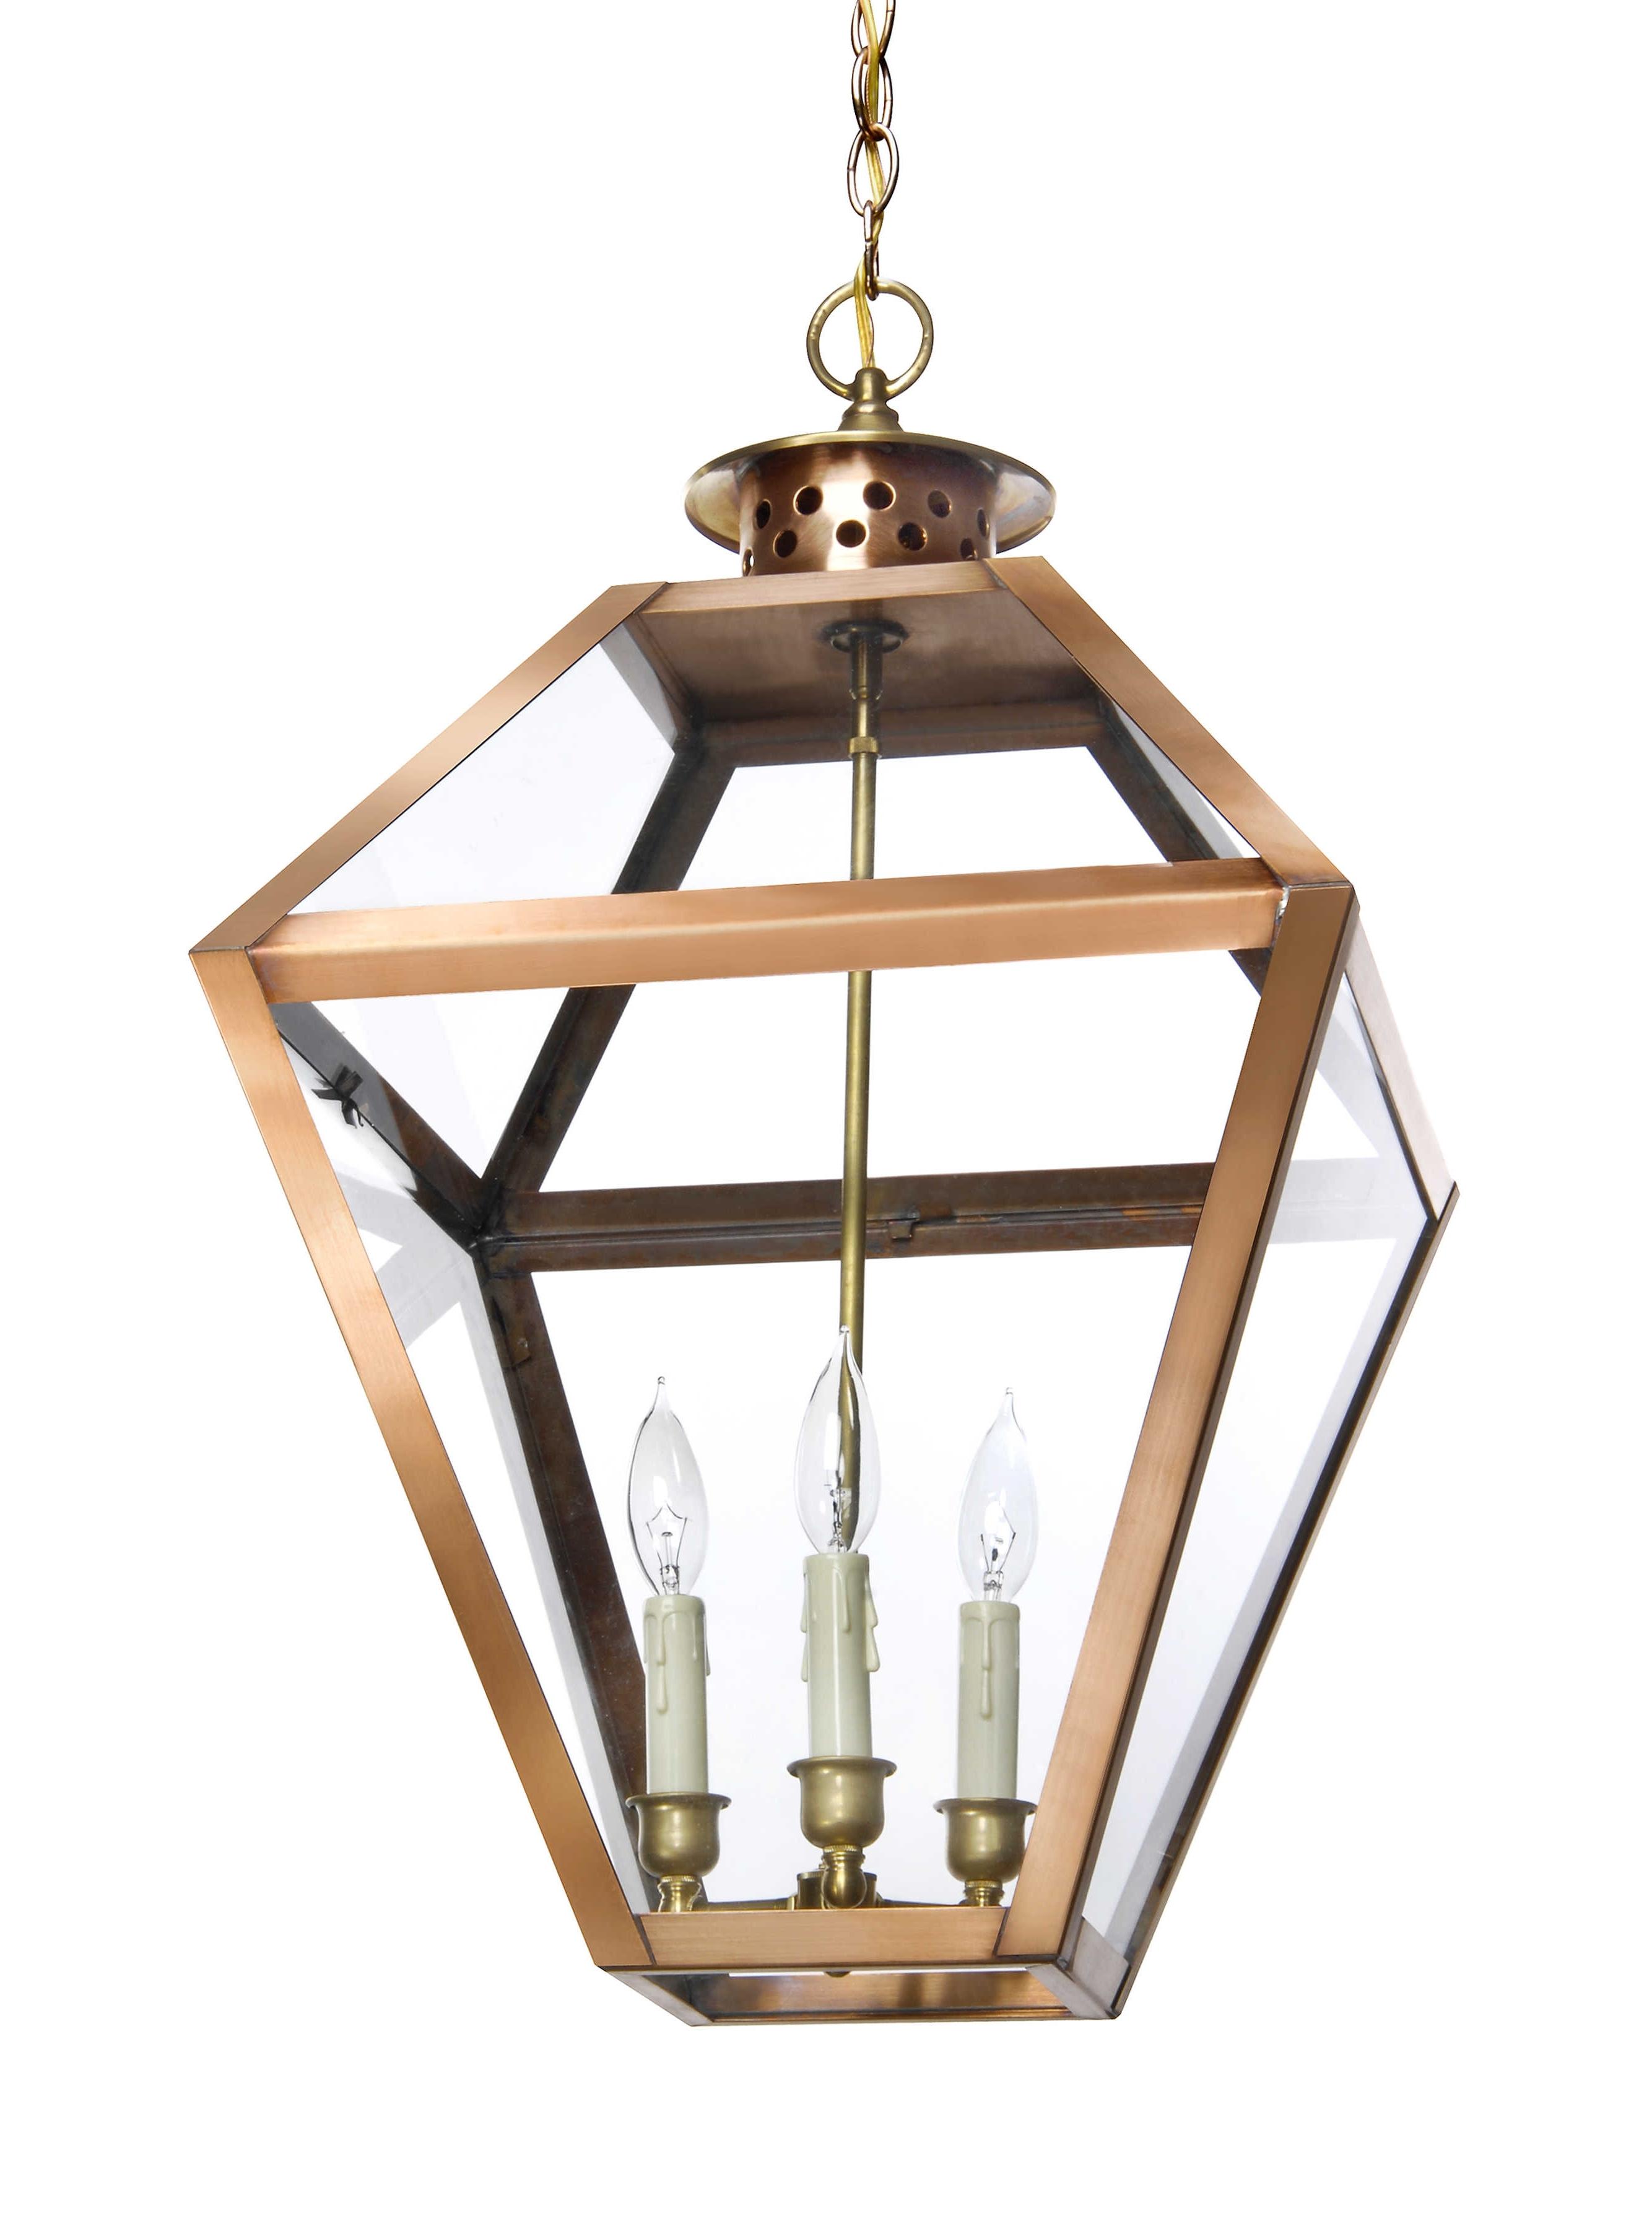 Bs 16 Hanging Light, Copper Lantern, Gas And Electric Lighting Regarding Popular Electric Outdoor Hanging Lanterns (View 3 of 20)